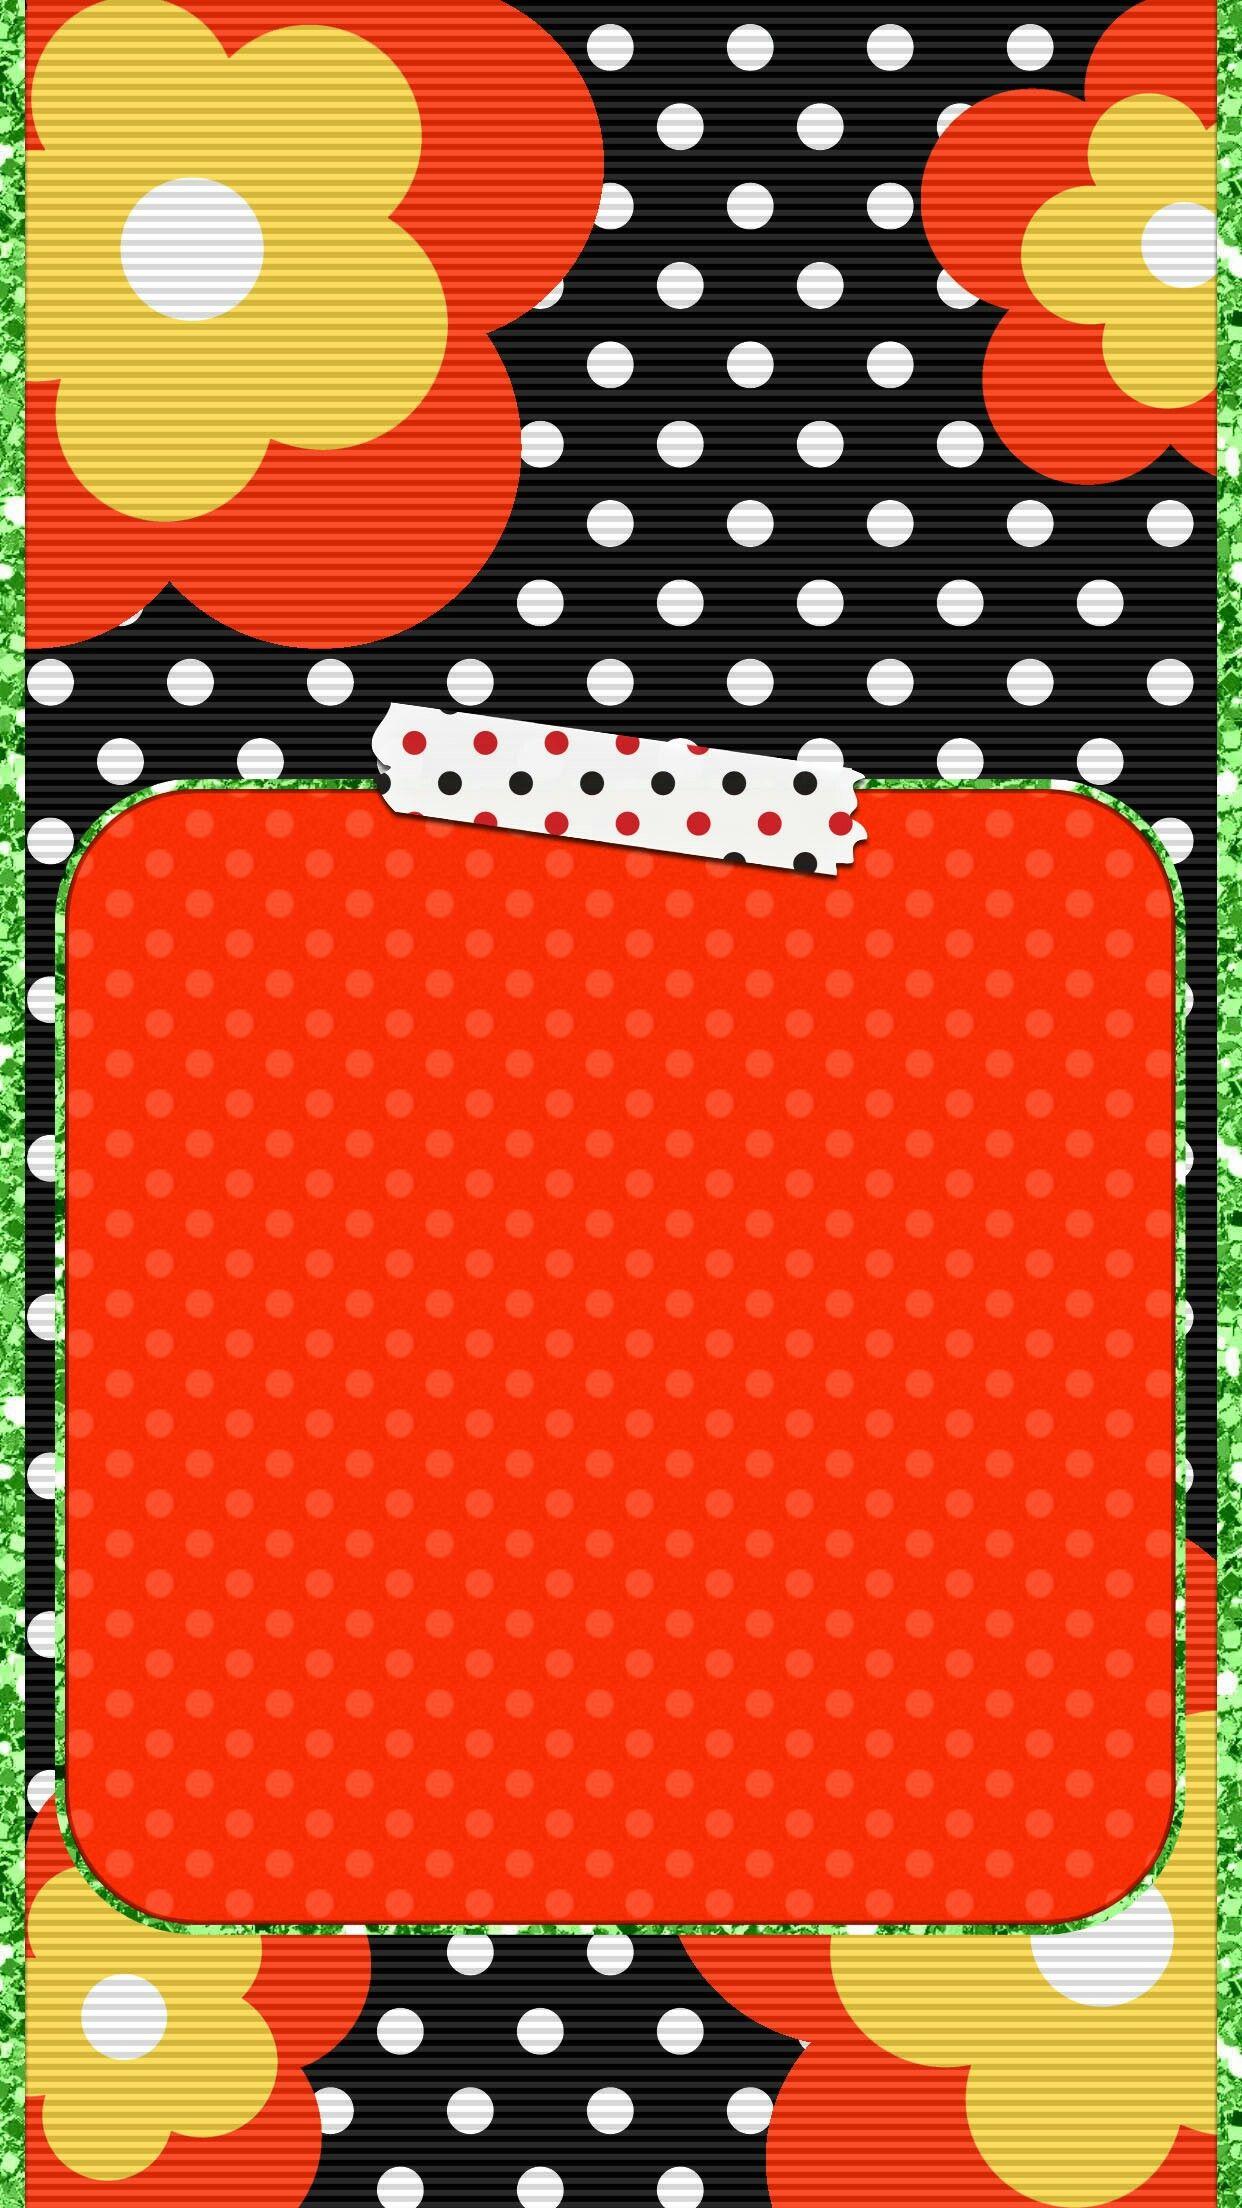 Cute ladybug wallpaper iphone Polka dots wallpaper